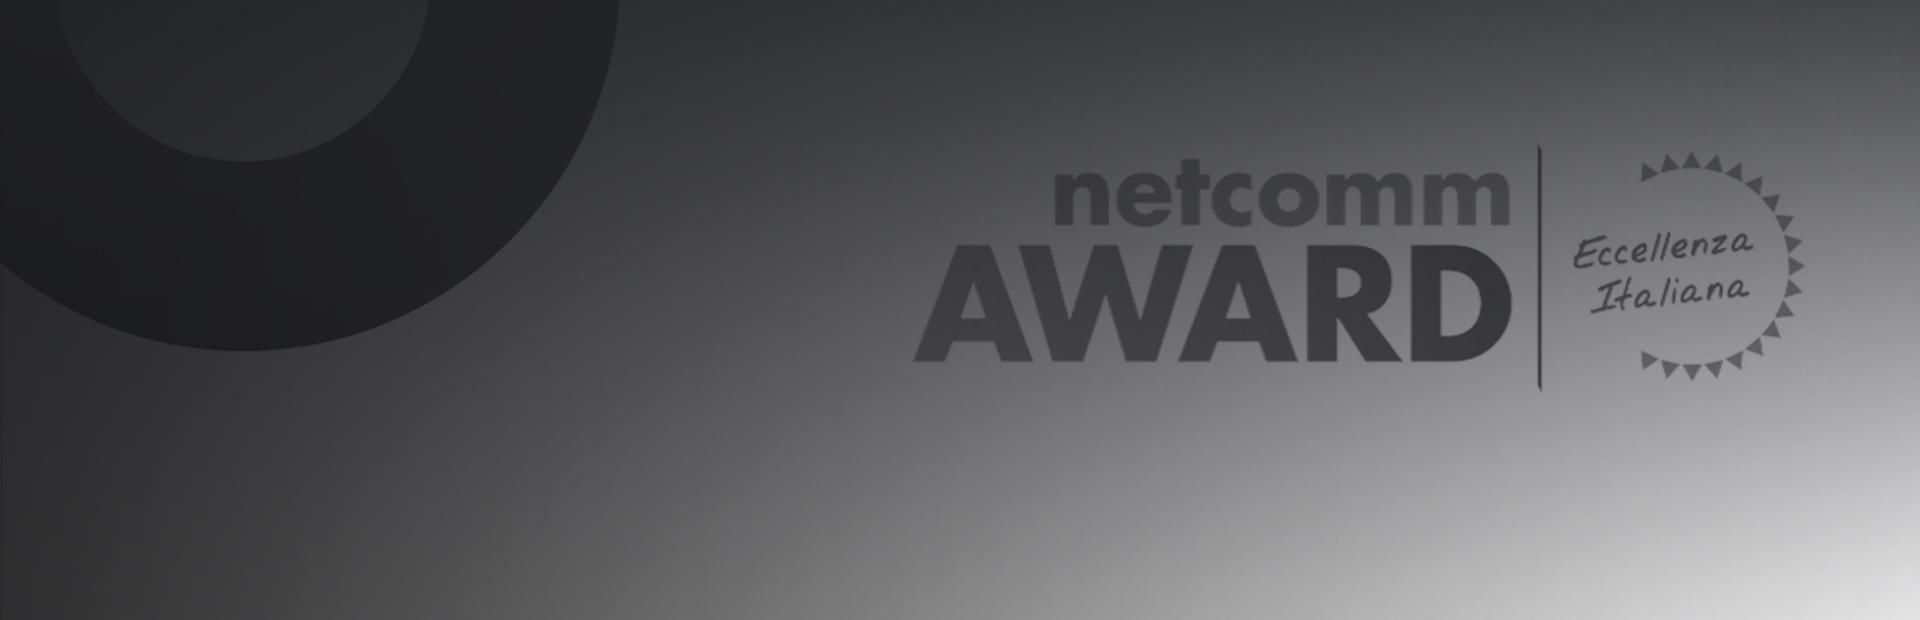 Netcomm award Tun2U B-Exit